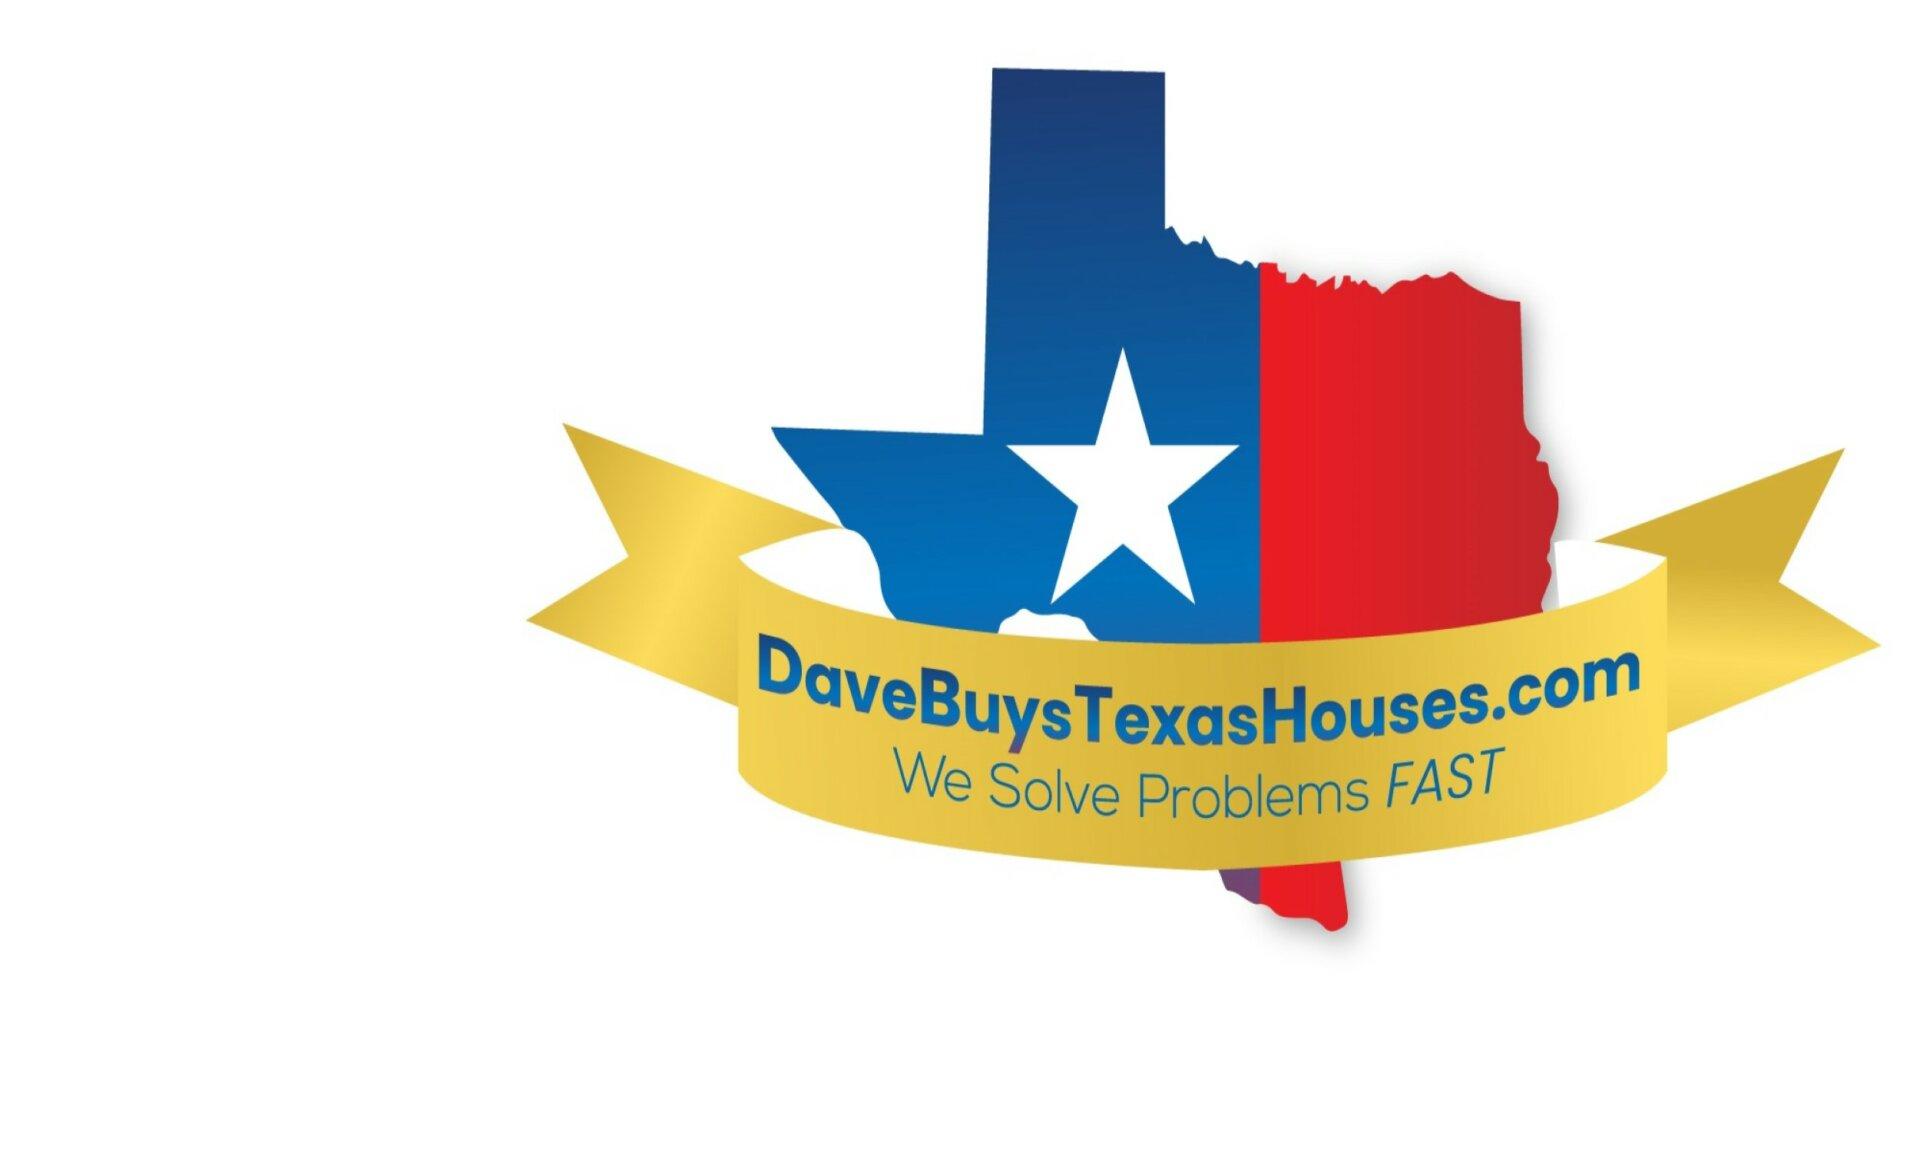 Dave Buys Texas Houses logo